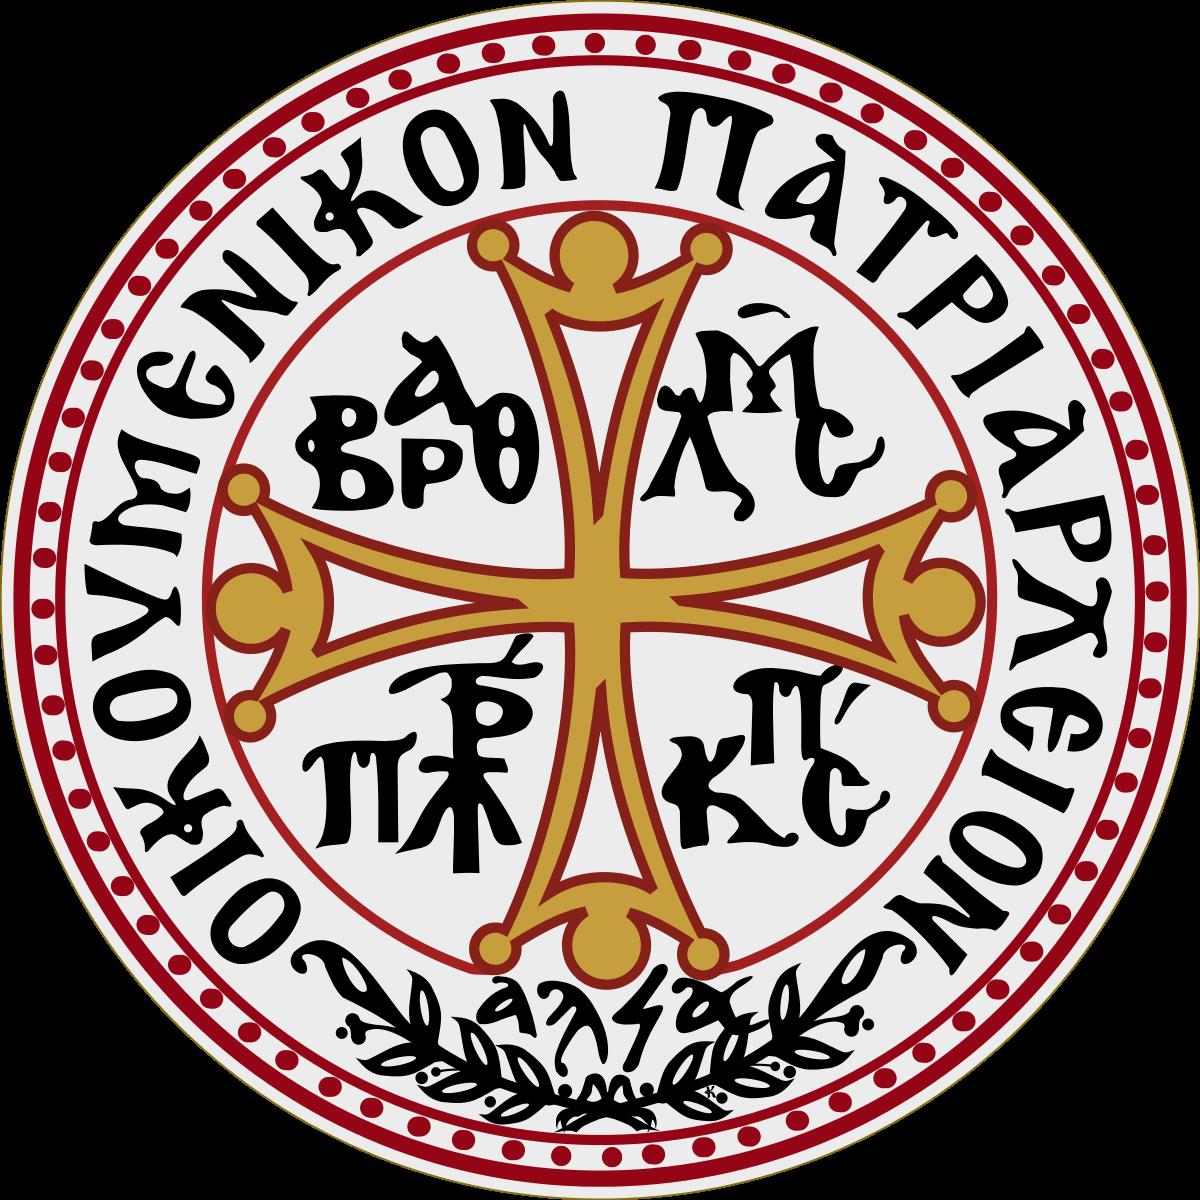 His Eminence Metropolitan Emmanuel, Metropolitan of France, Ecumenical Patriarchate.png